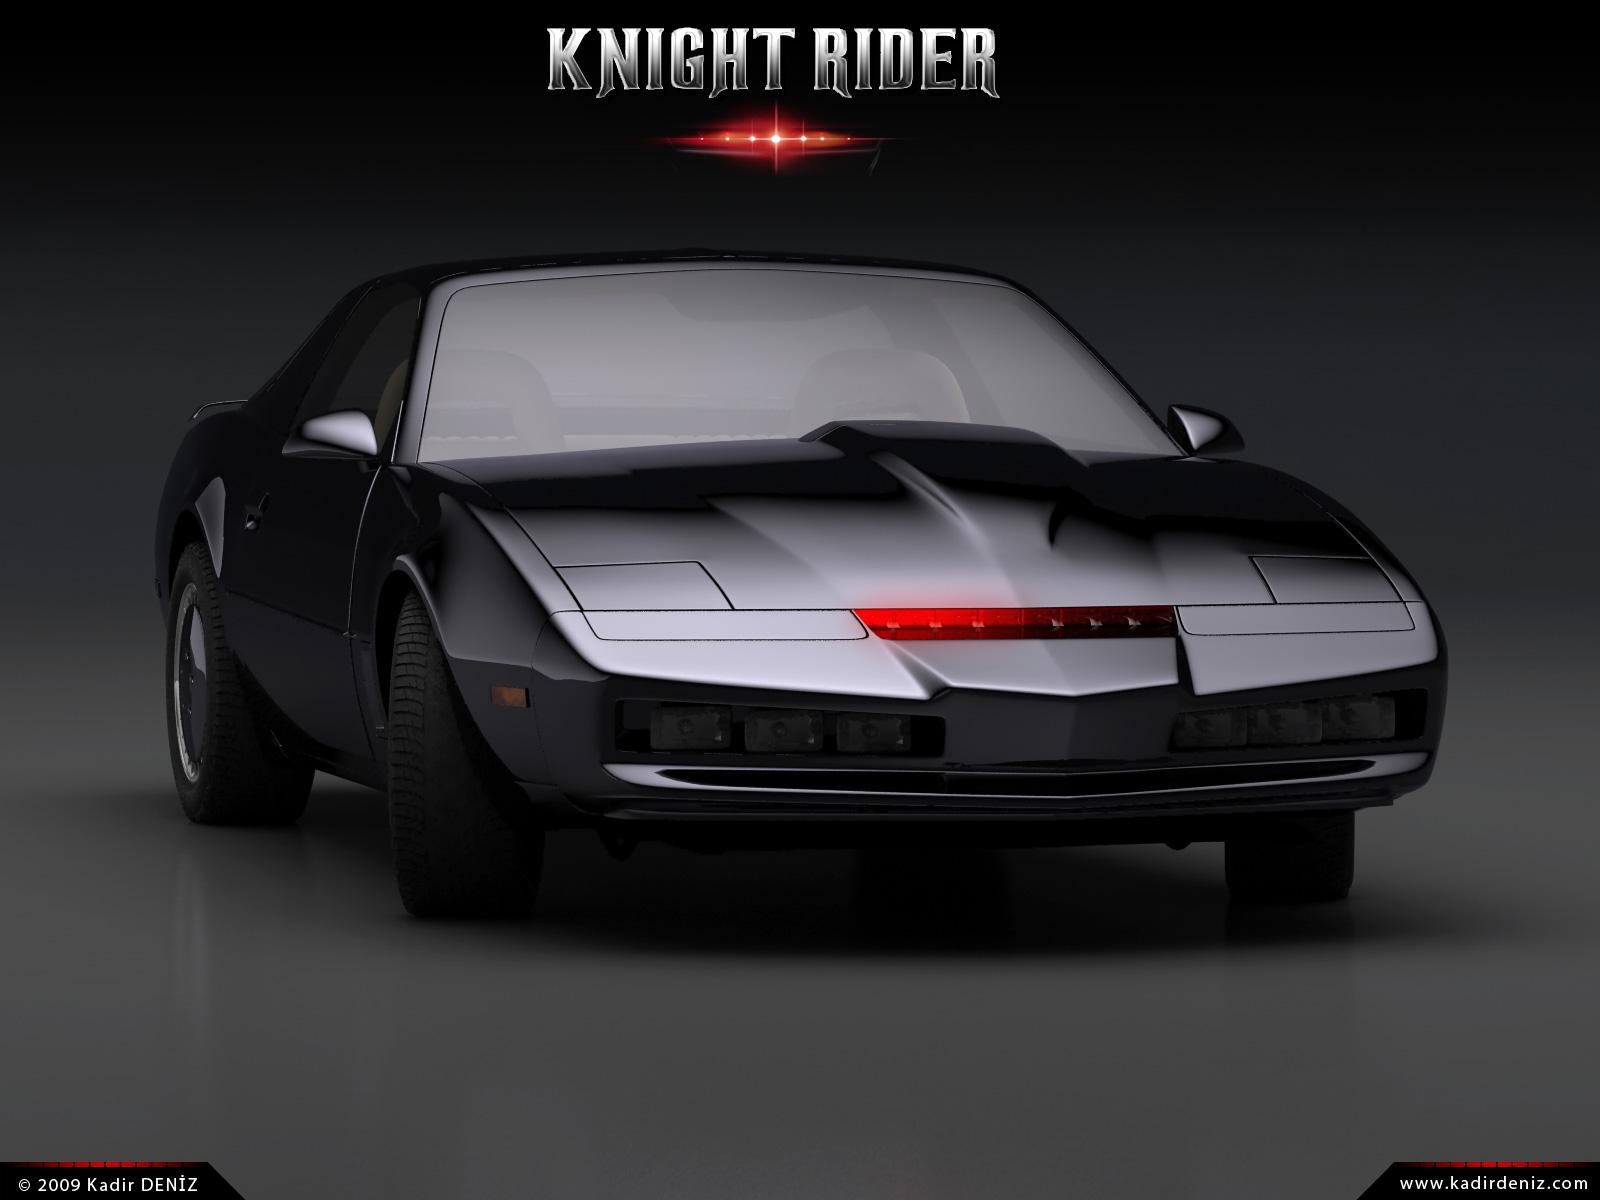 Knight Rider Animated Wallpaper Old vs New Kni 1600x1200